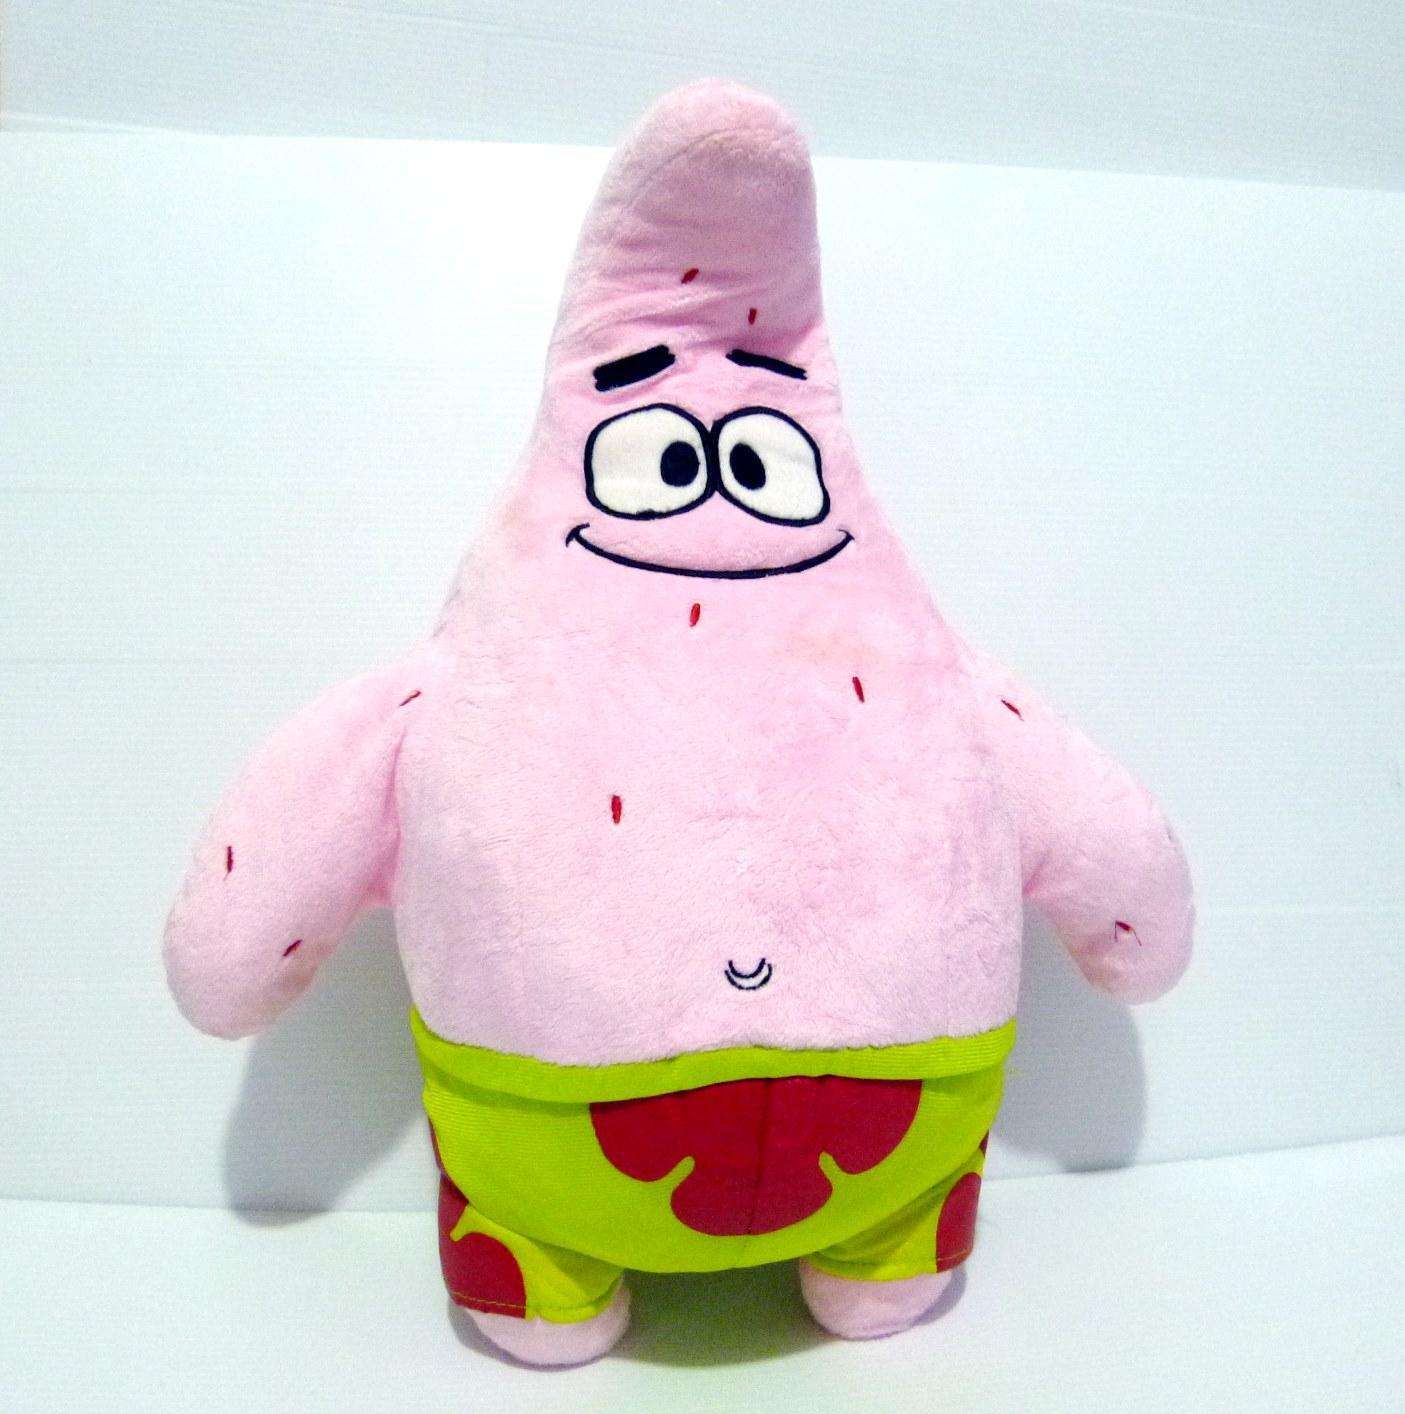 Boneka Patrick Original Nickelodeon Viacom Big Size Patrick Star Spongebob  Squarepants 587b967956